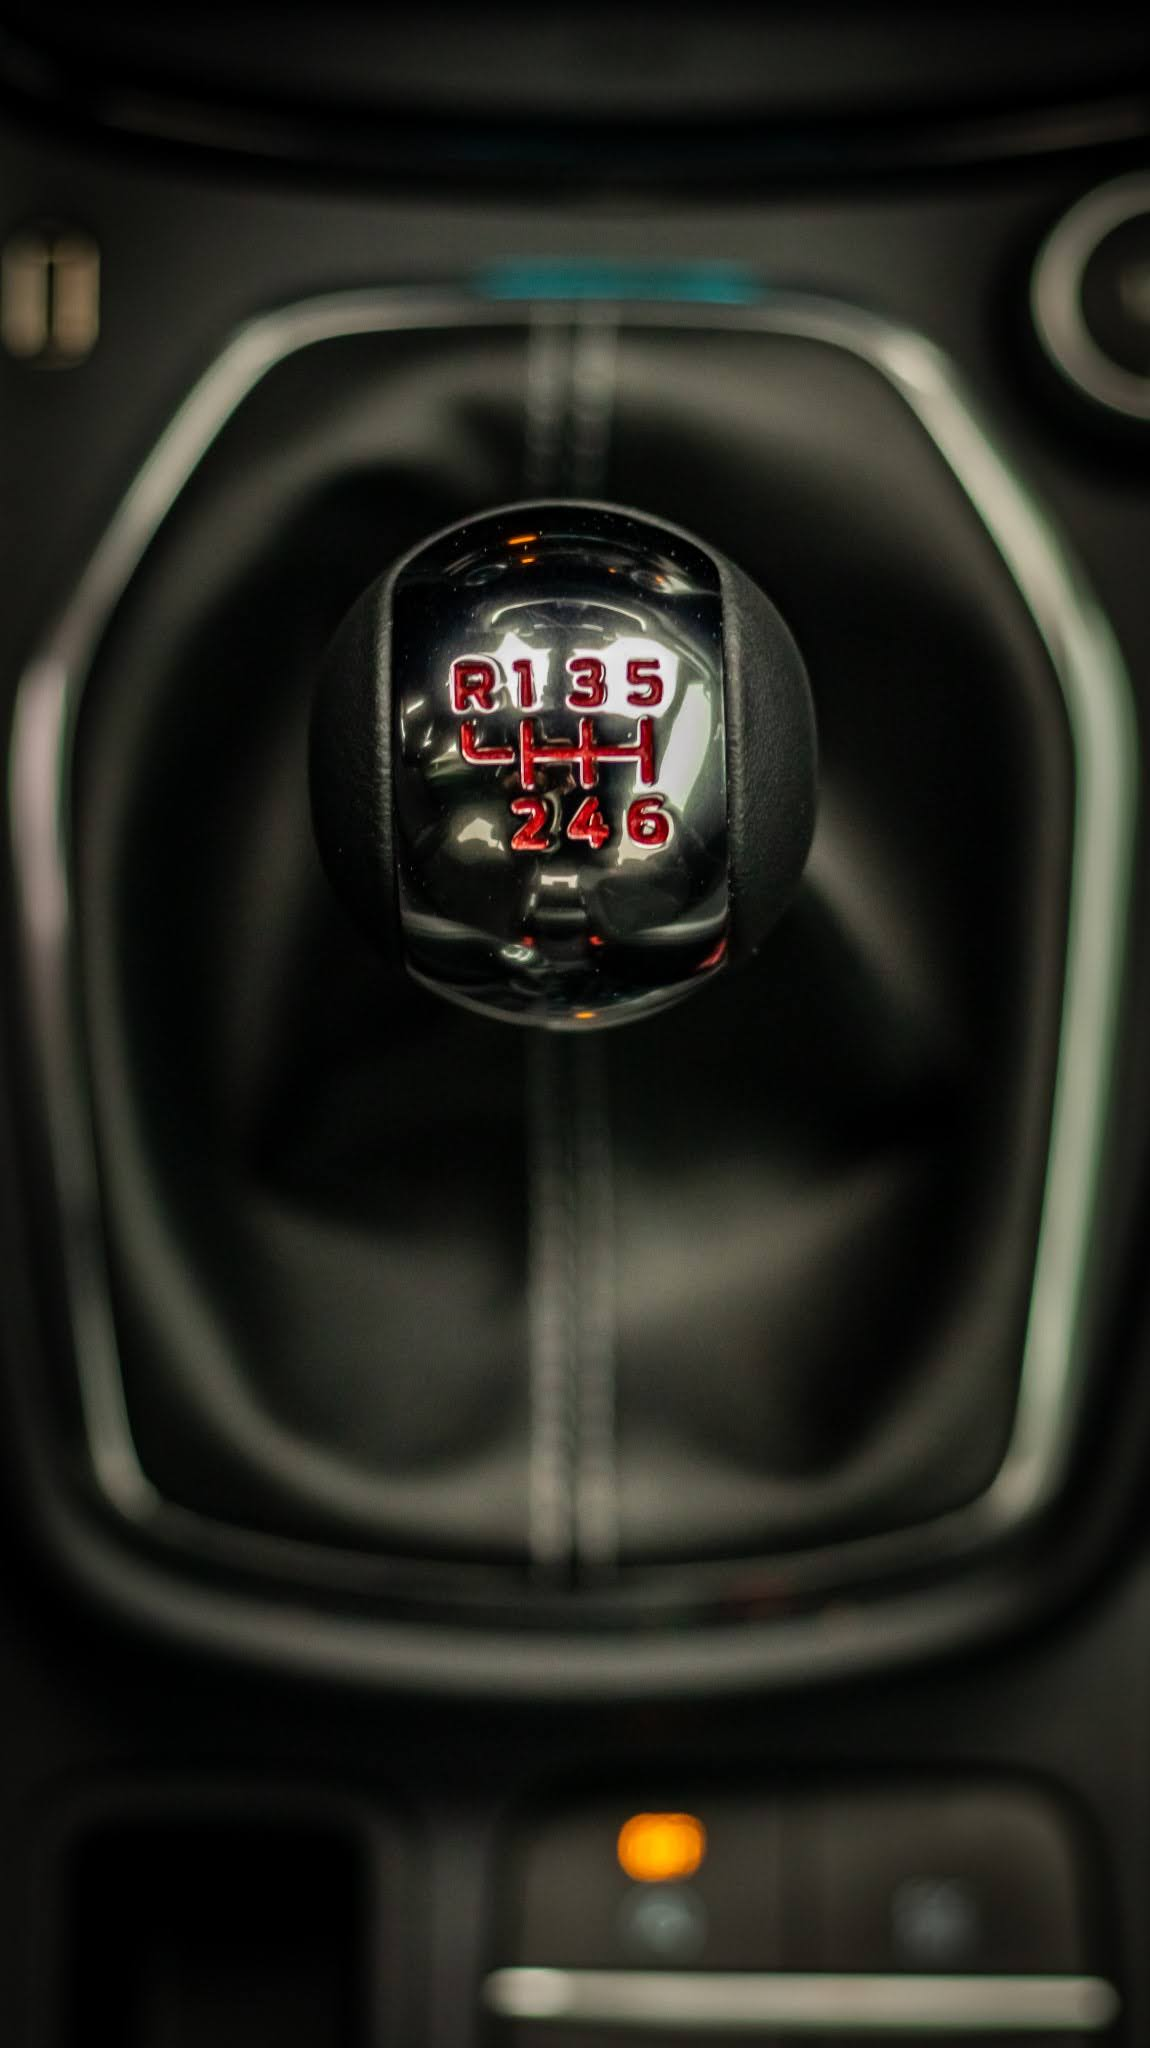 ord Puma ST 2020 1.5 EcoBoost 200 CP M6